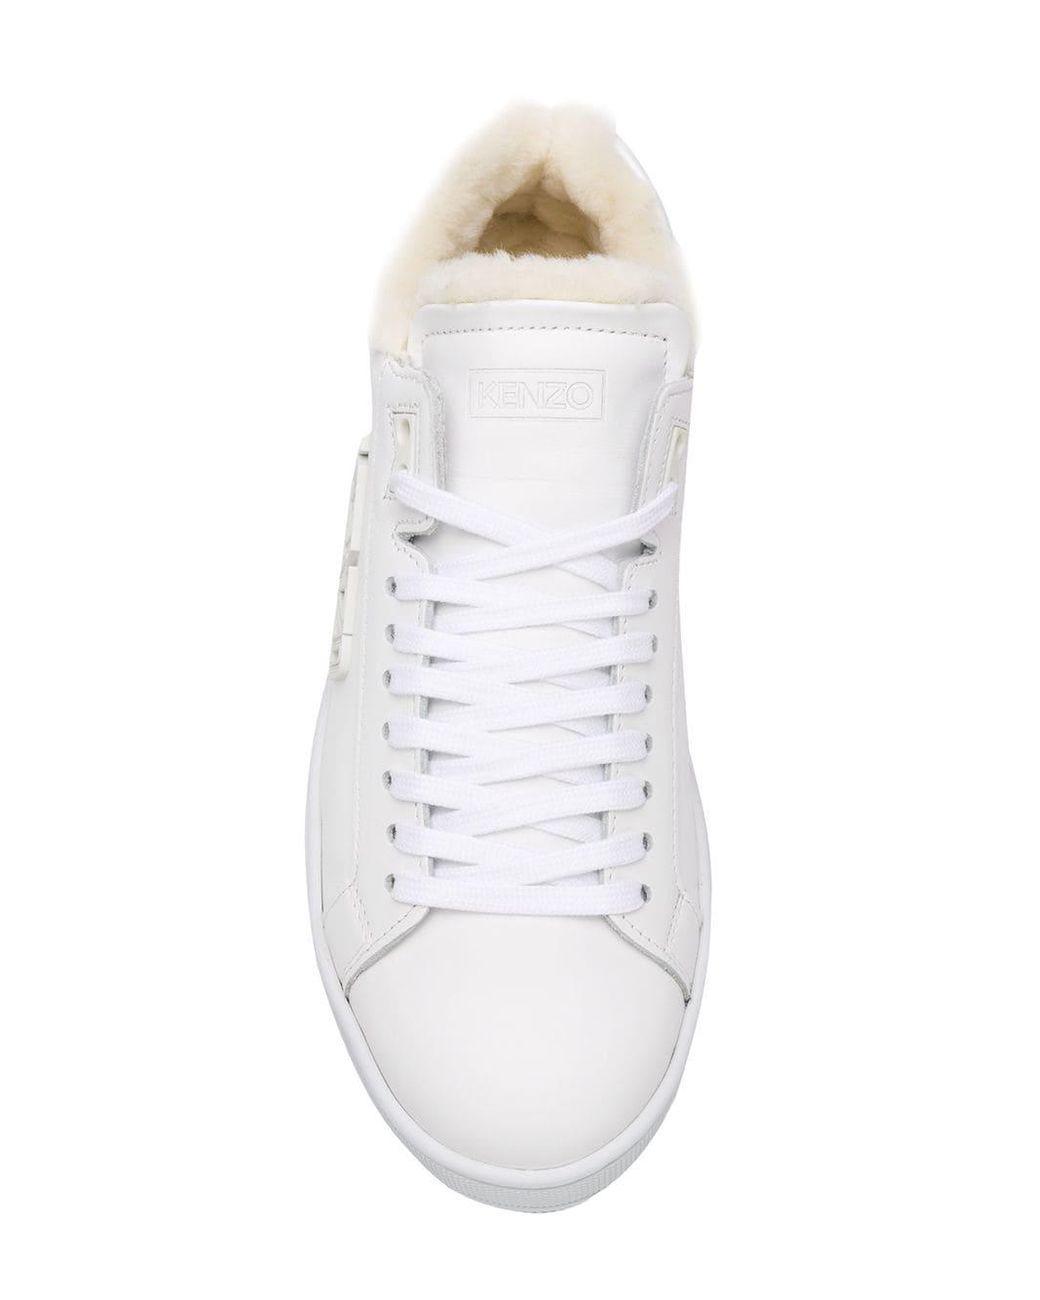 De Tennix Baskets Blanc Femme Coloris 0NnwXP8Ok